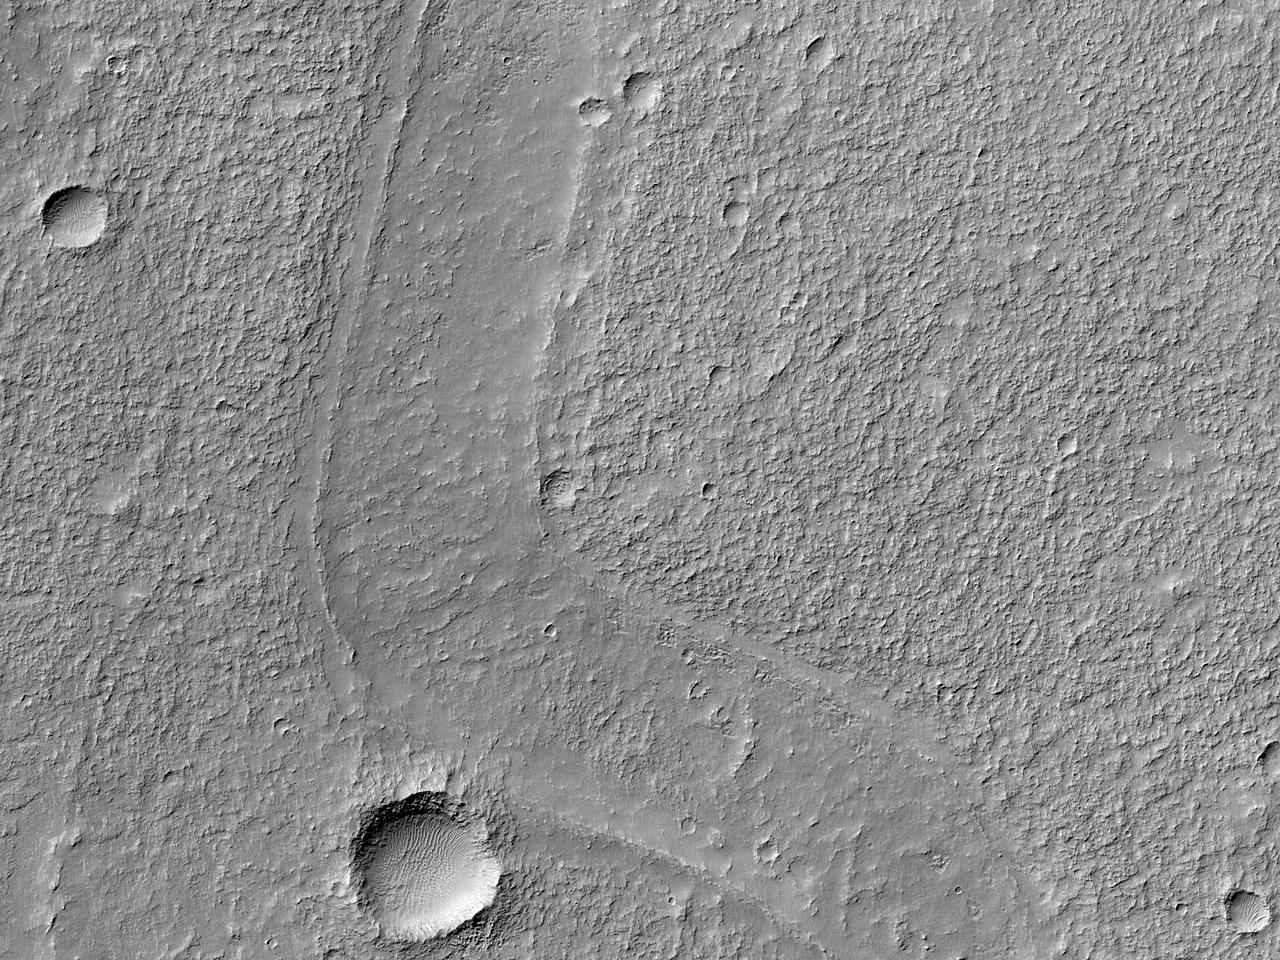 Интересная формация земли Terra Sirenum